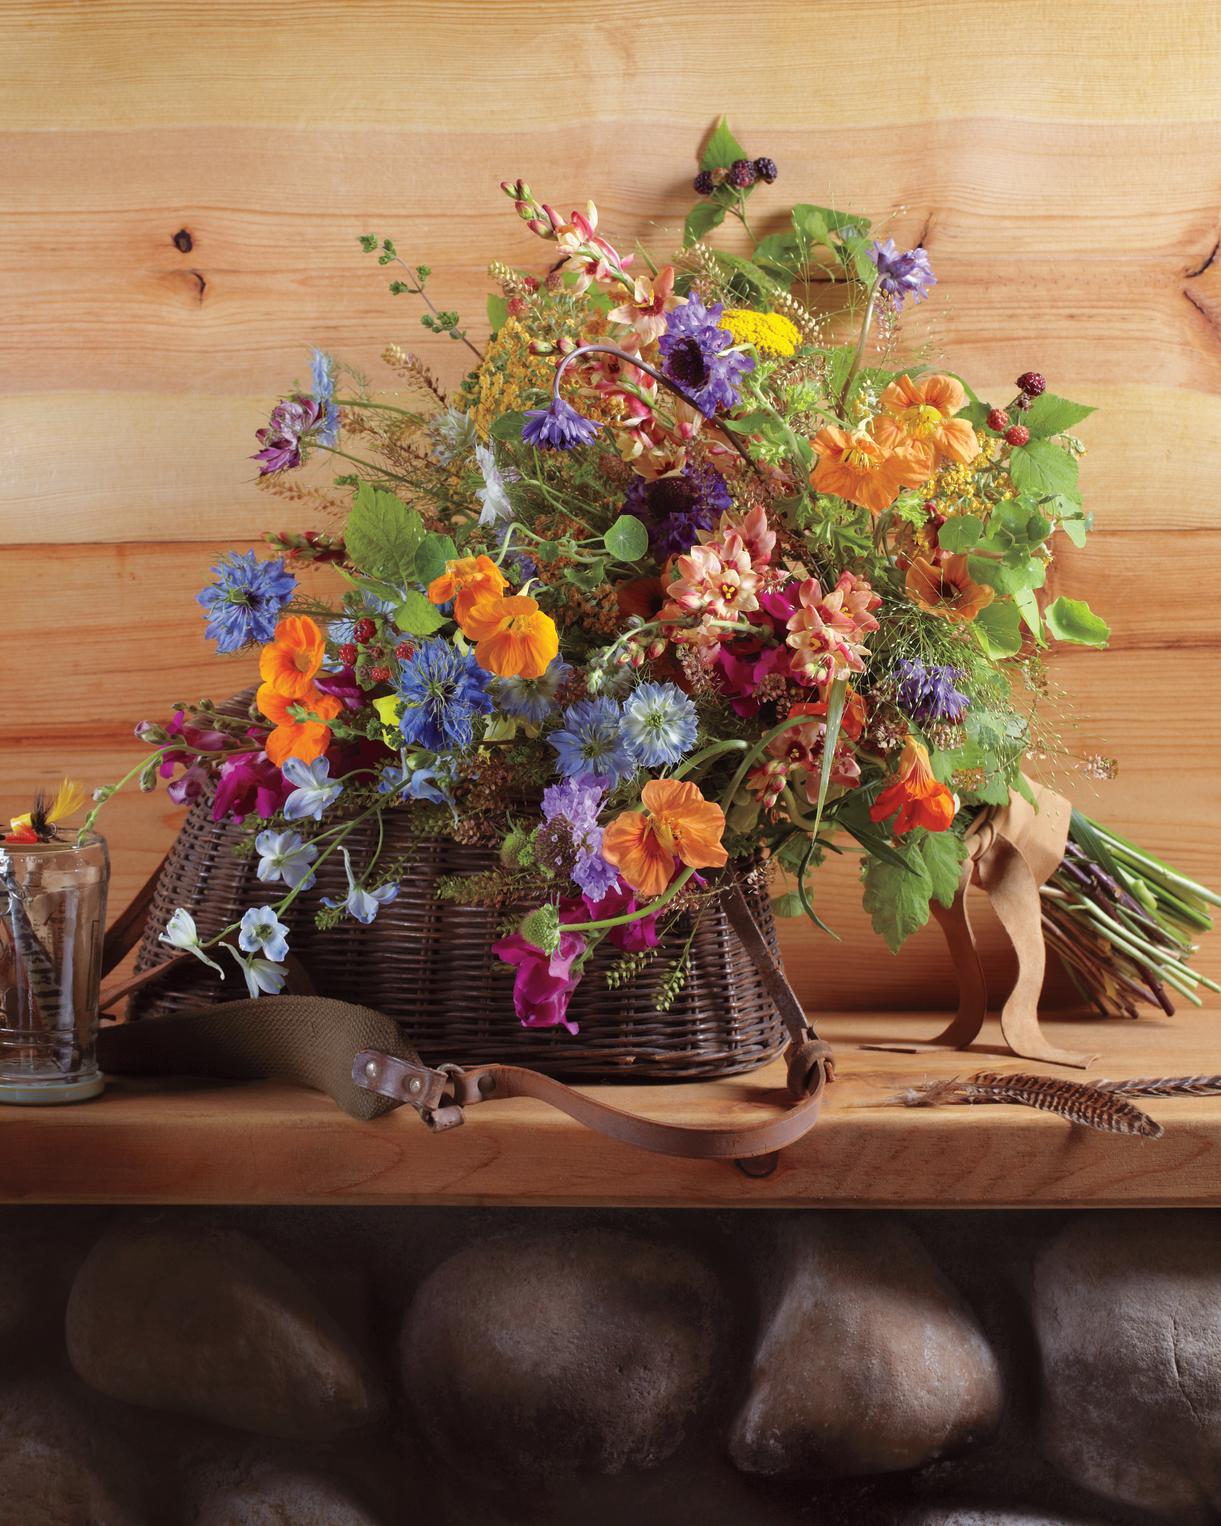 flowers-mountains-458-mwd108999.jpg